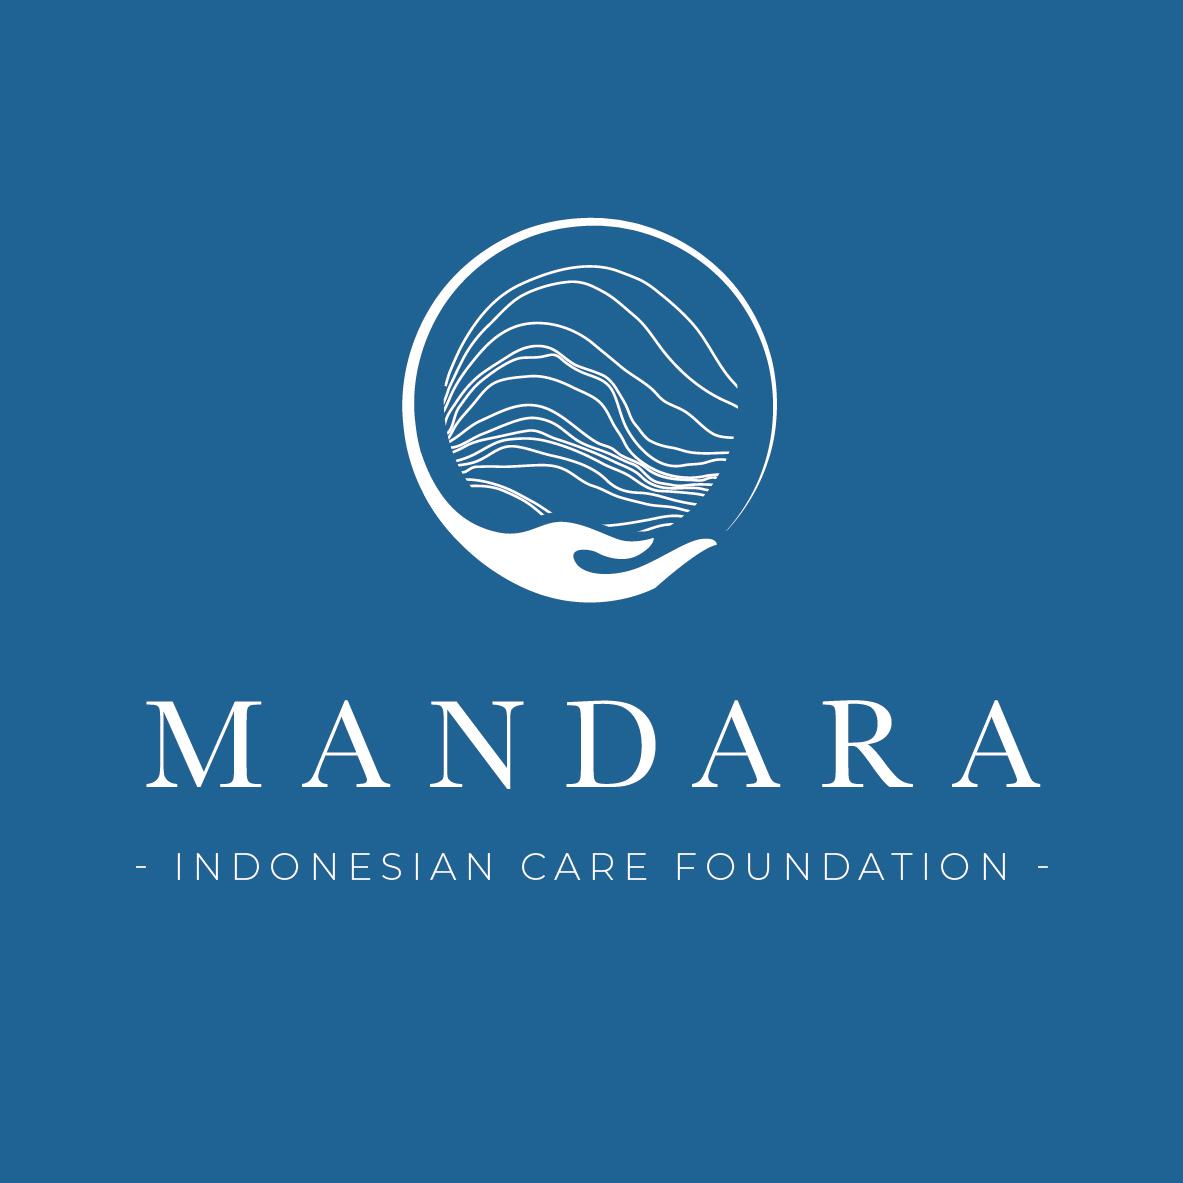 Fondation Mandara